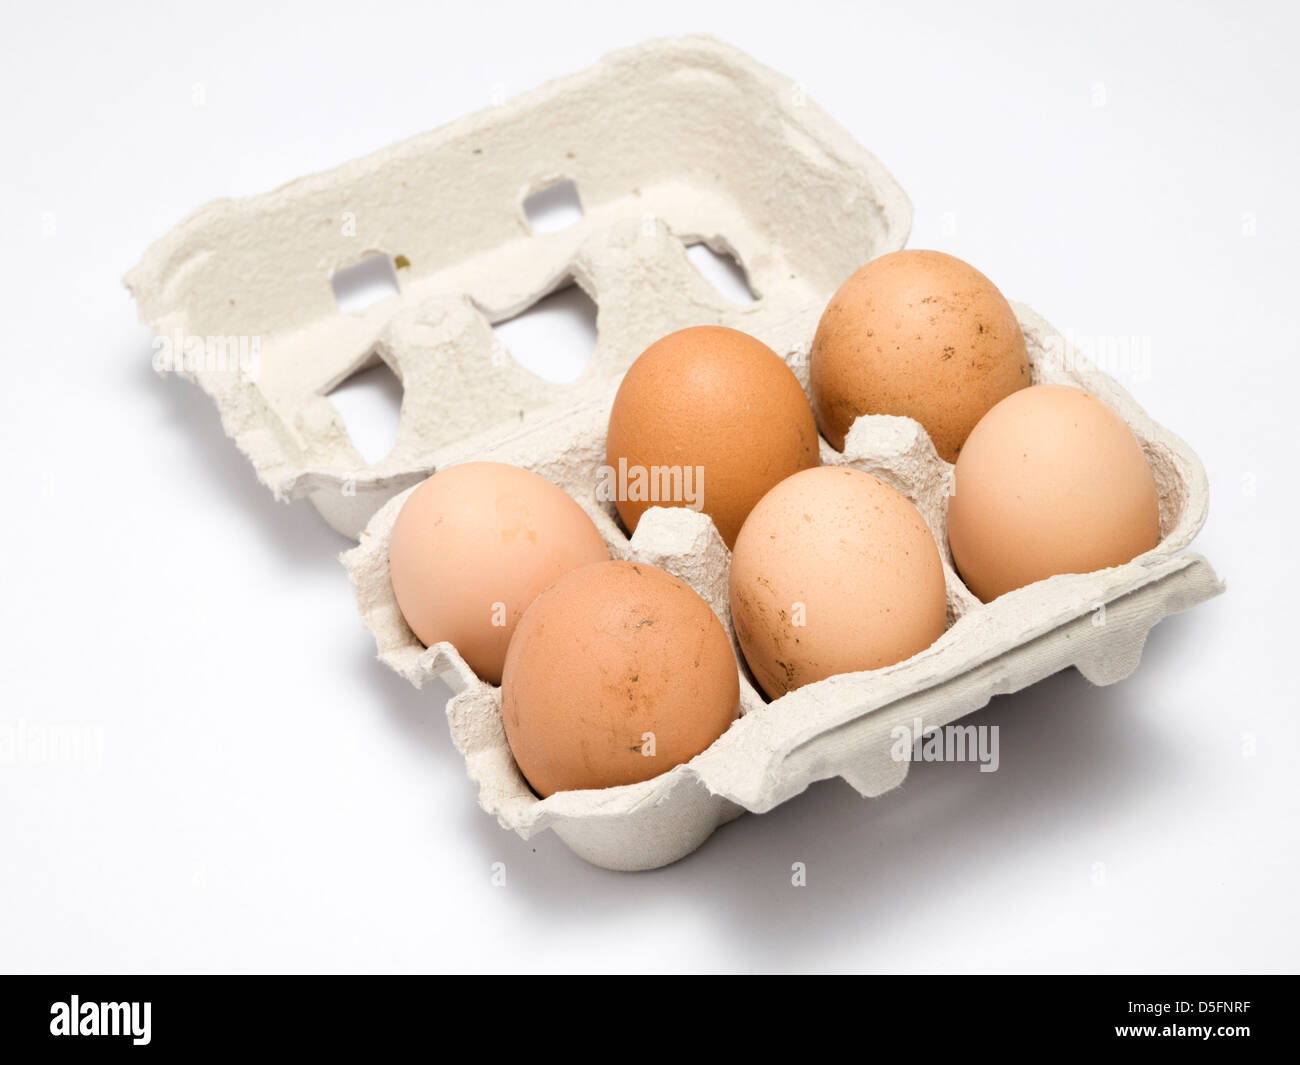 Egg Carton Recycled Stock Photos Egg Carton Recycled Stock Images